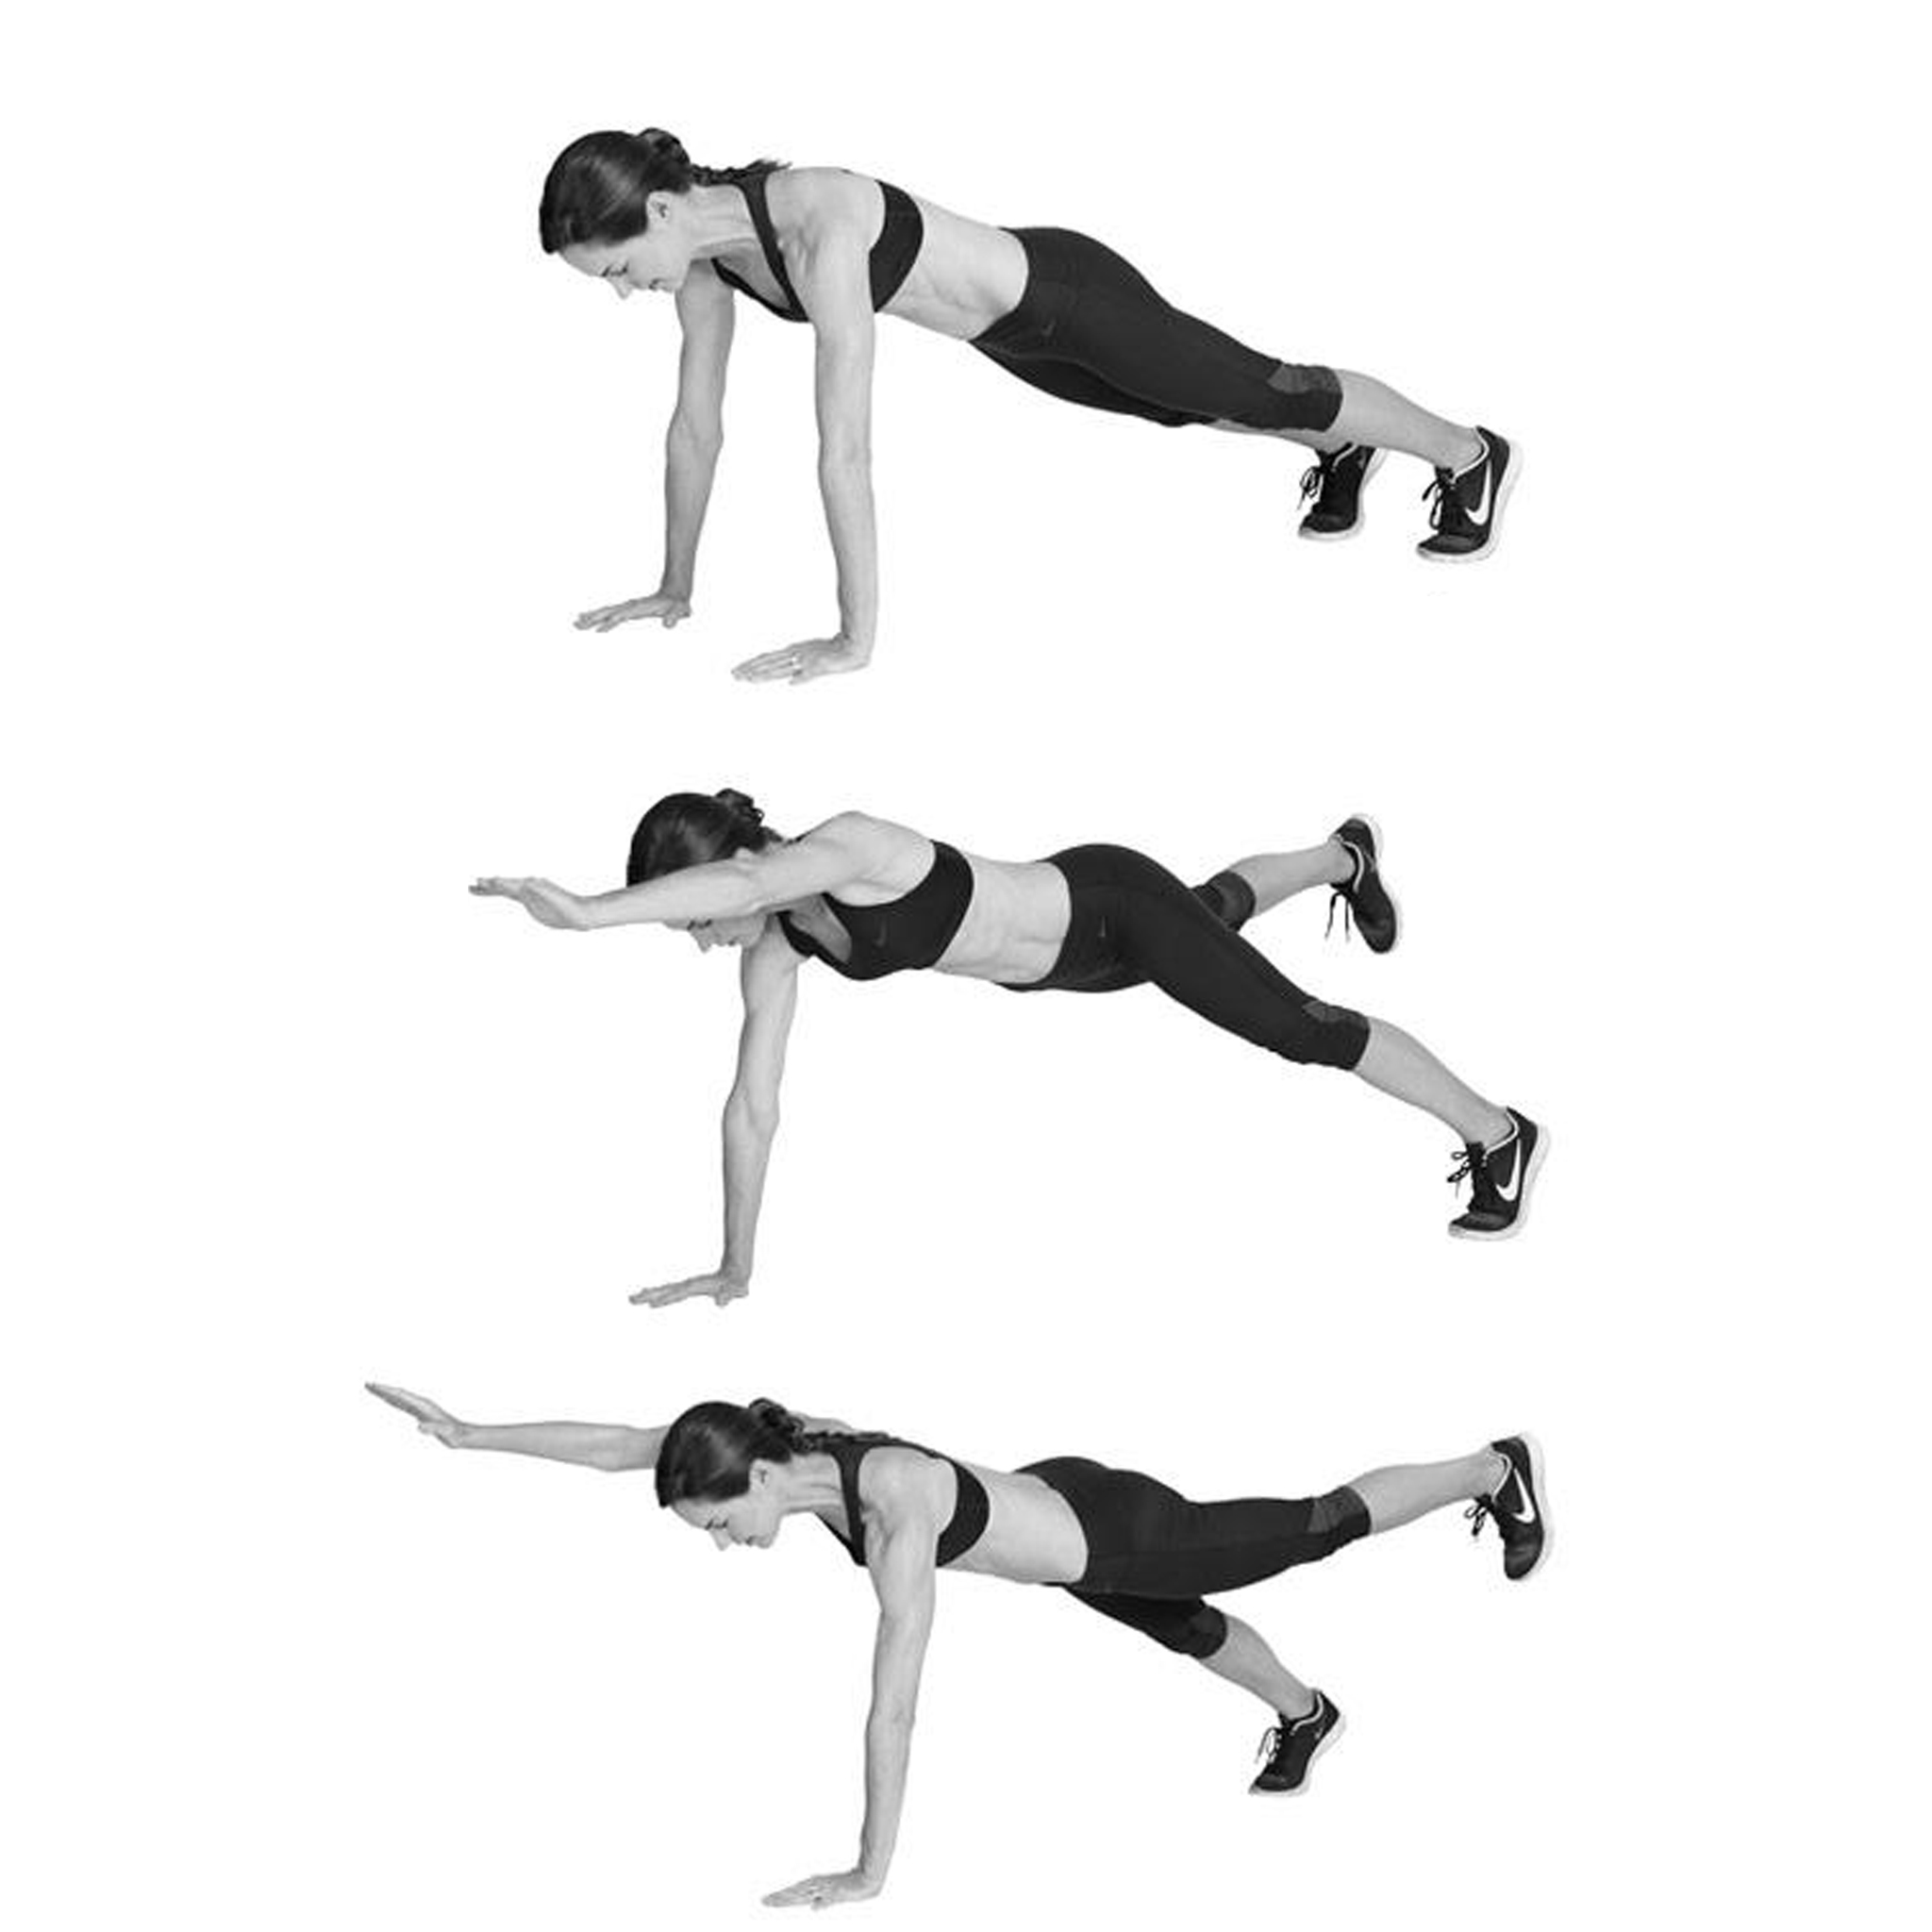 superman-exercise